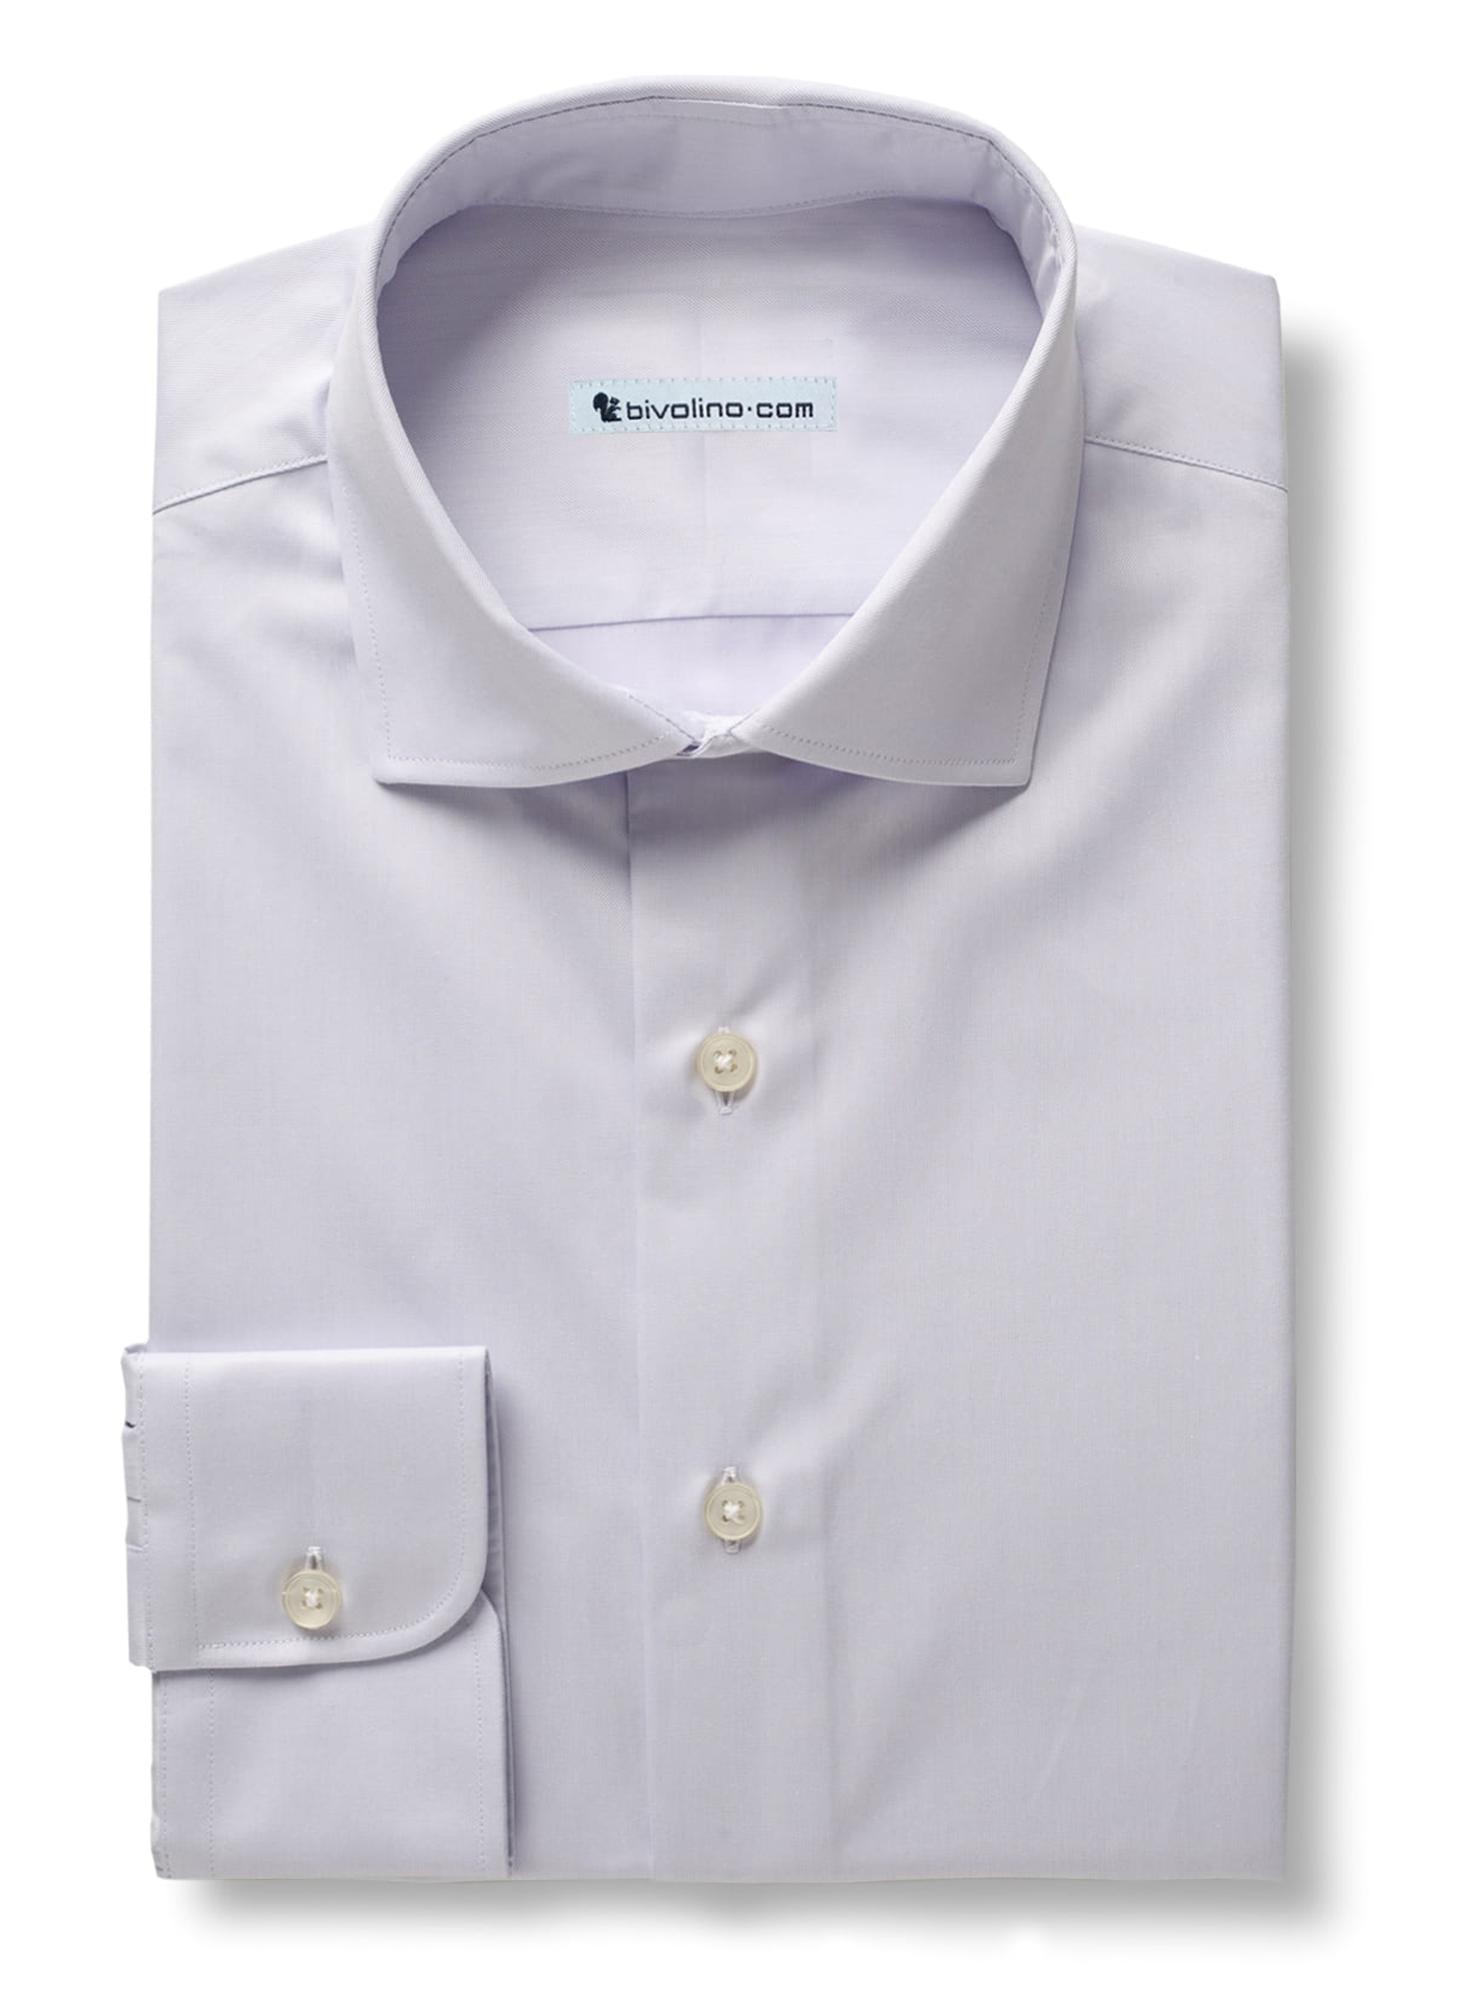 PREZZIANO - Plain lilac twill shirt - SANTI 3